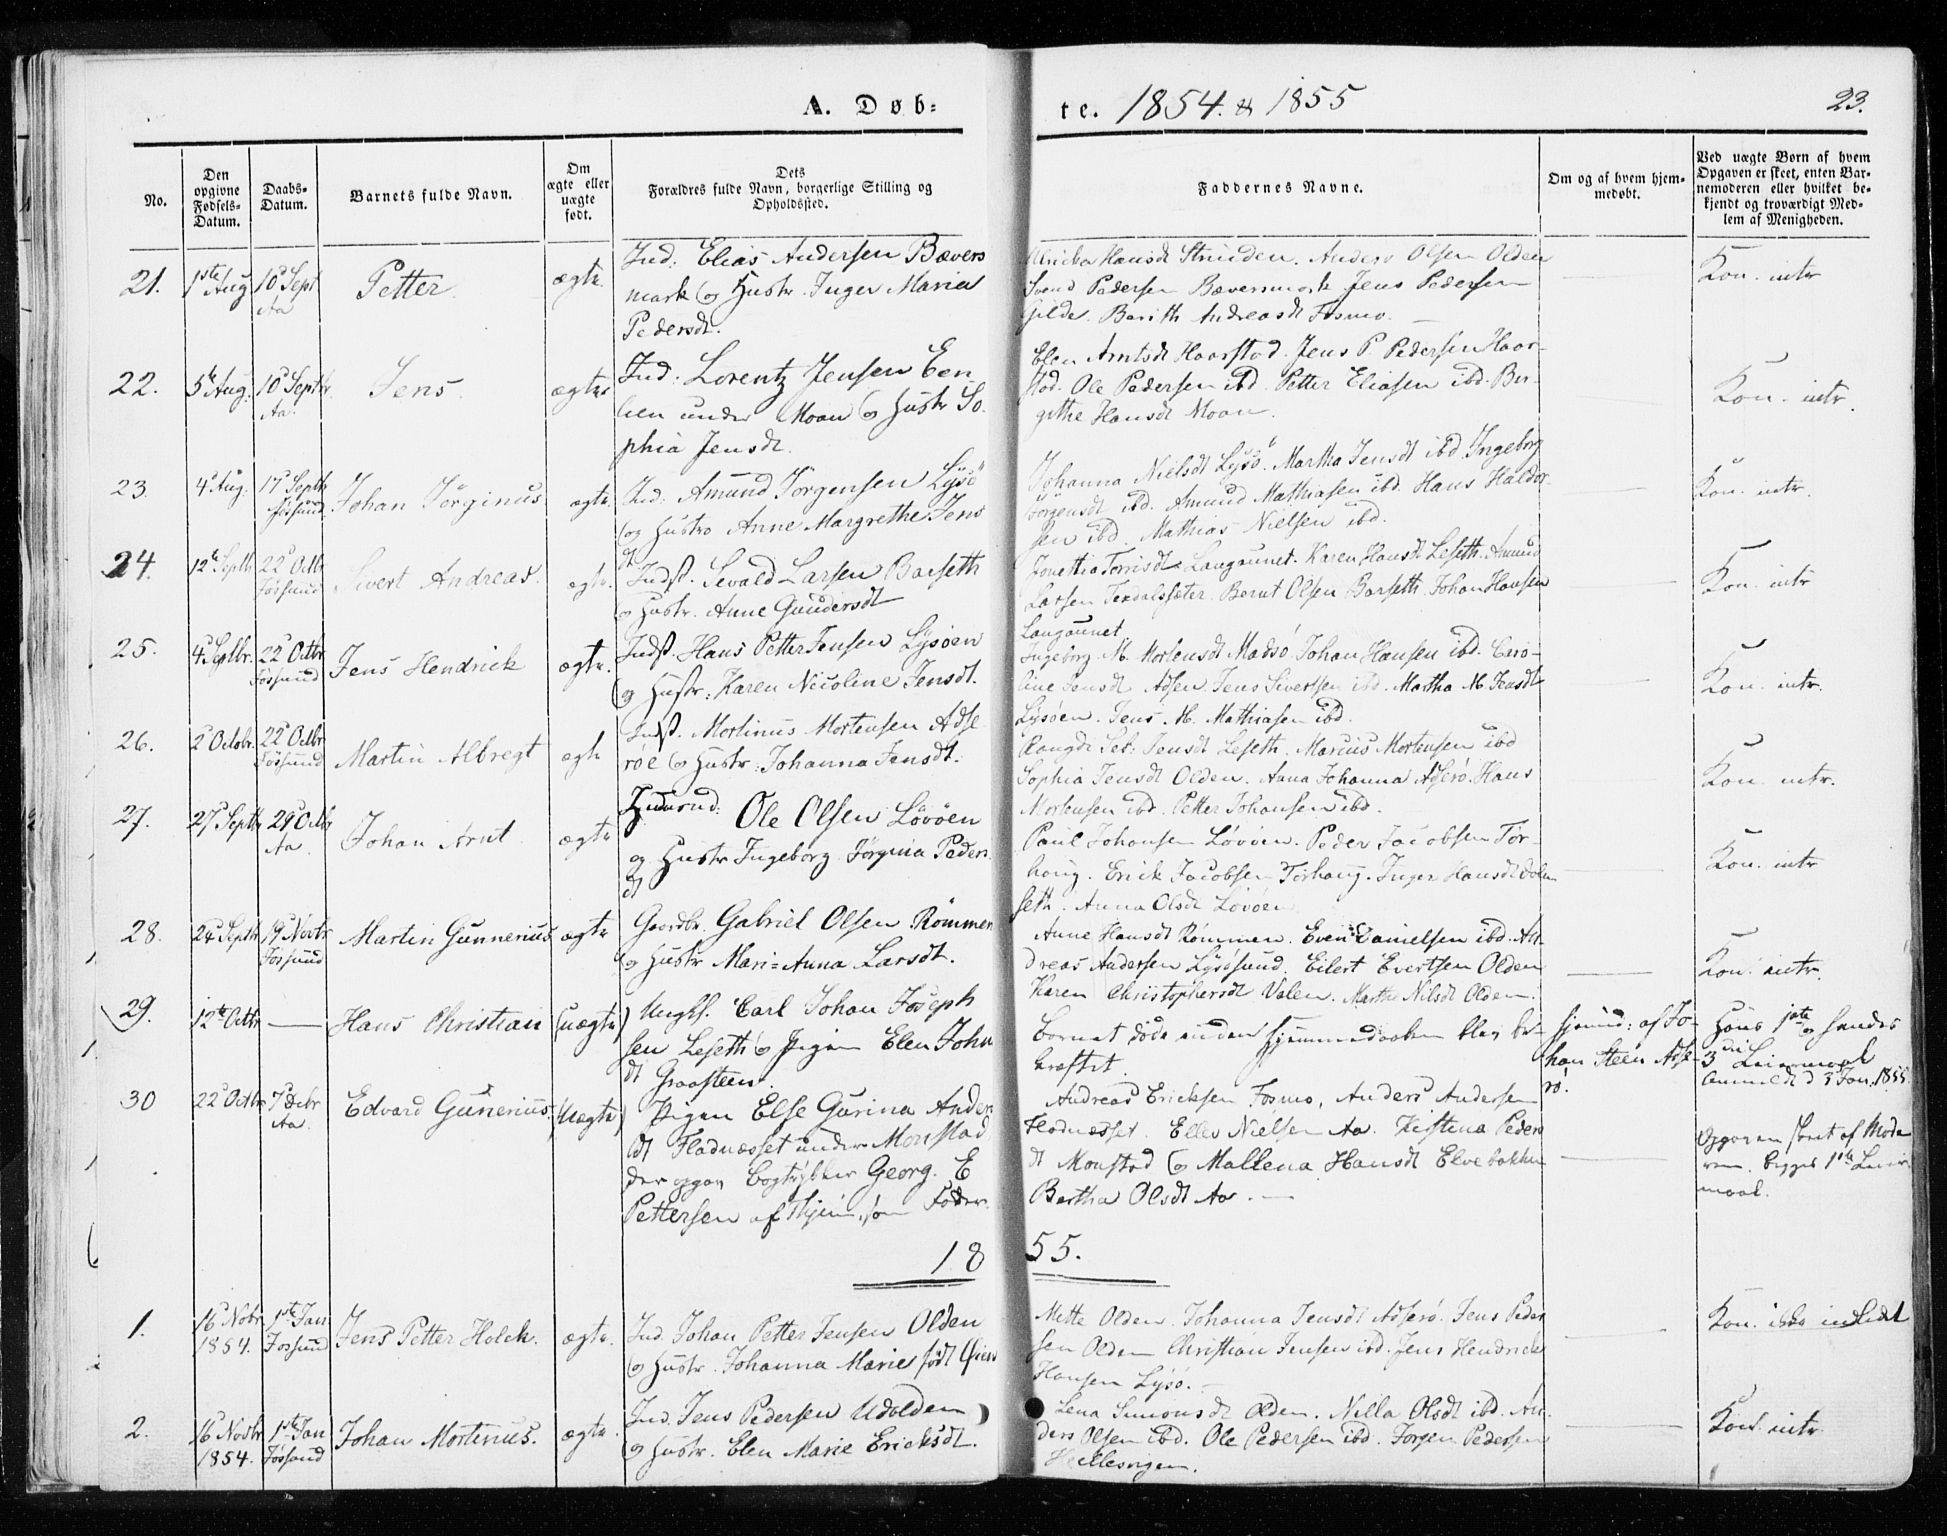 SAT, Ministerialprotokoller, klokkerbøker og fødselsregistre - Sør-Trøndelag, 655/L0677: Parish register (official) no. 655A06, 1847-1860, p. 23